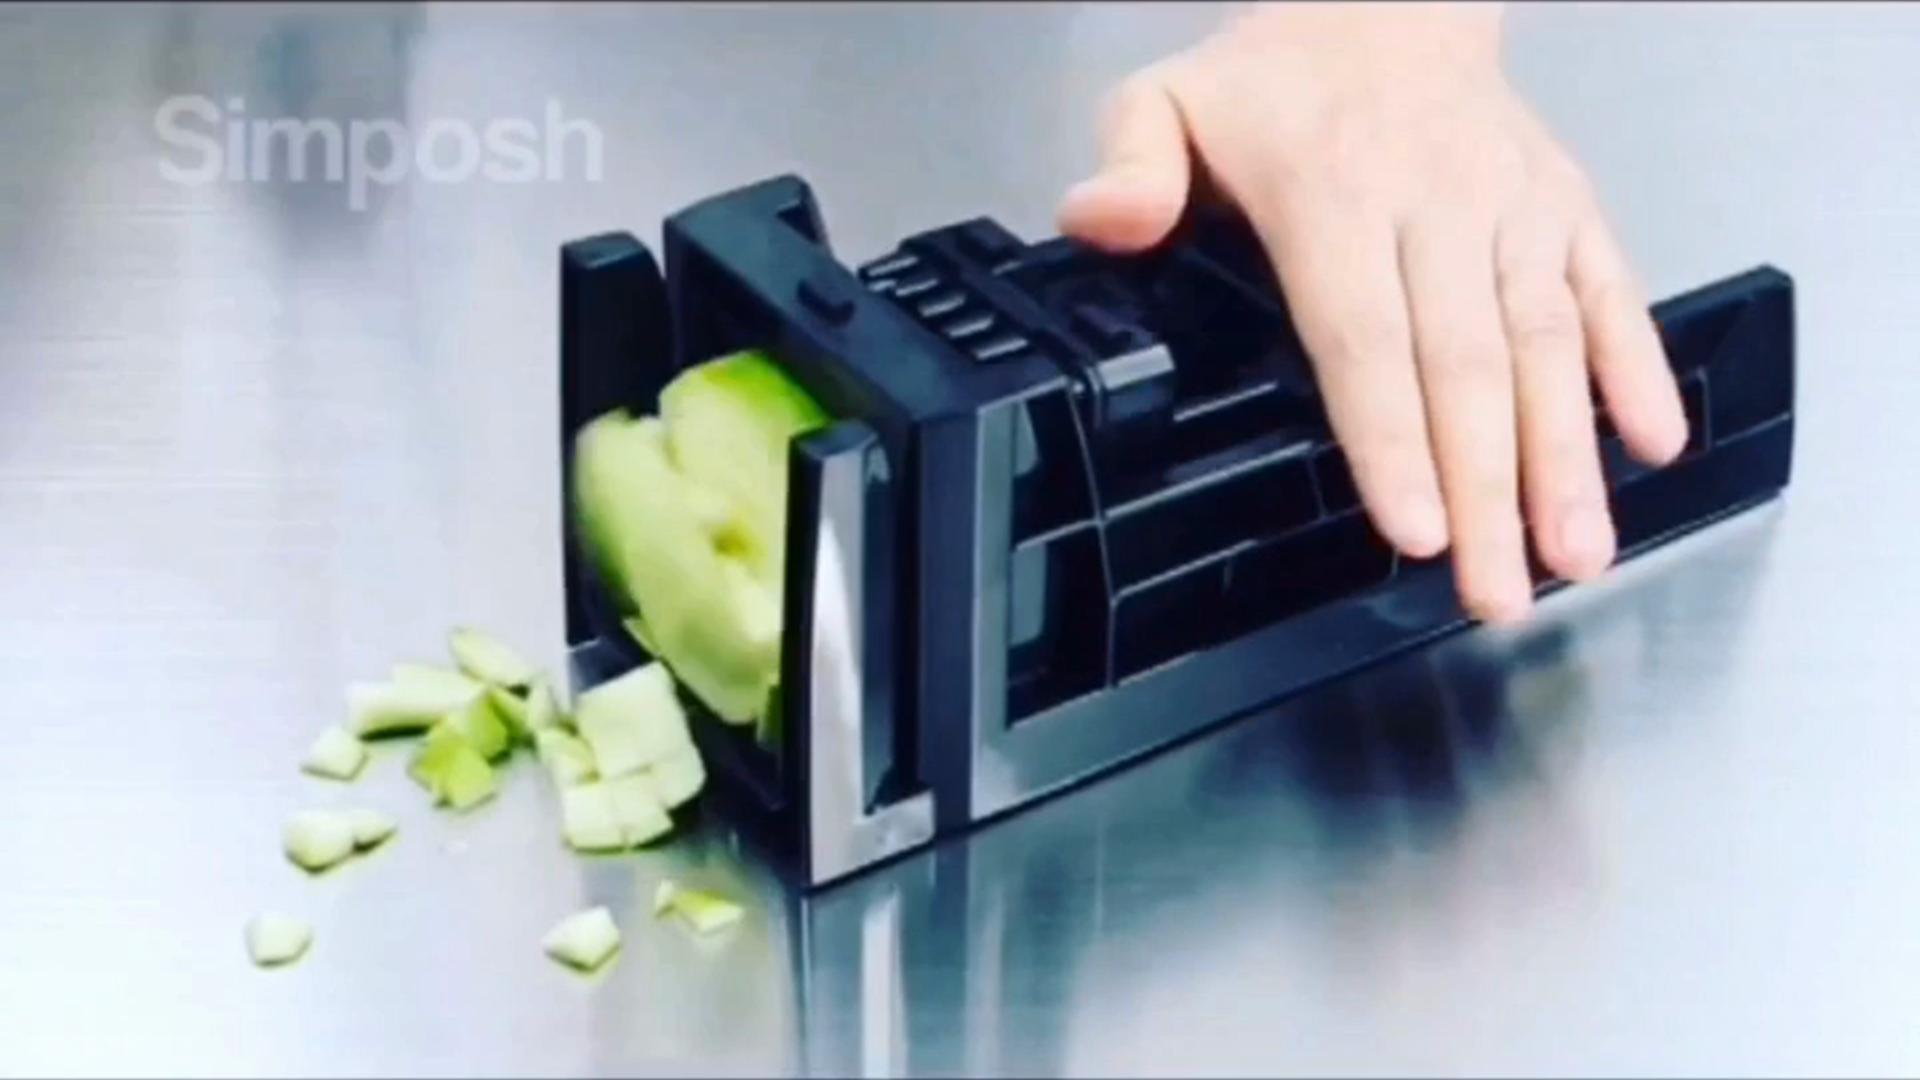 Black Simposh Easy Food Dicer